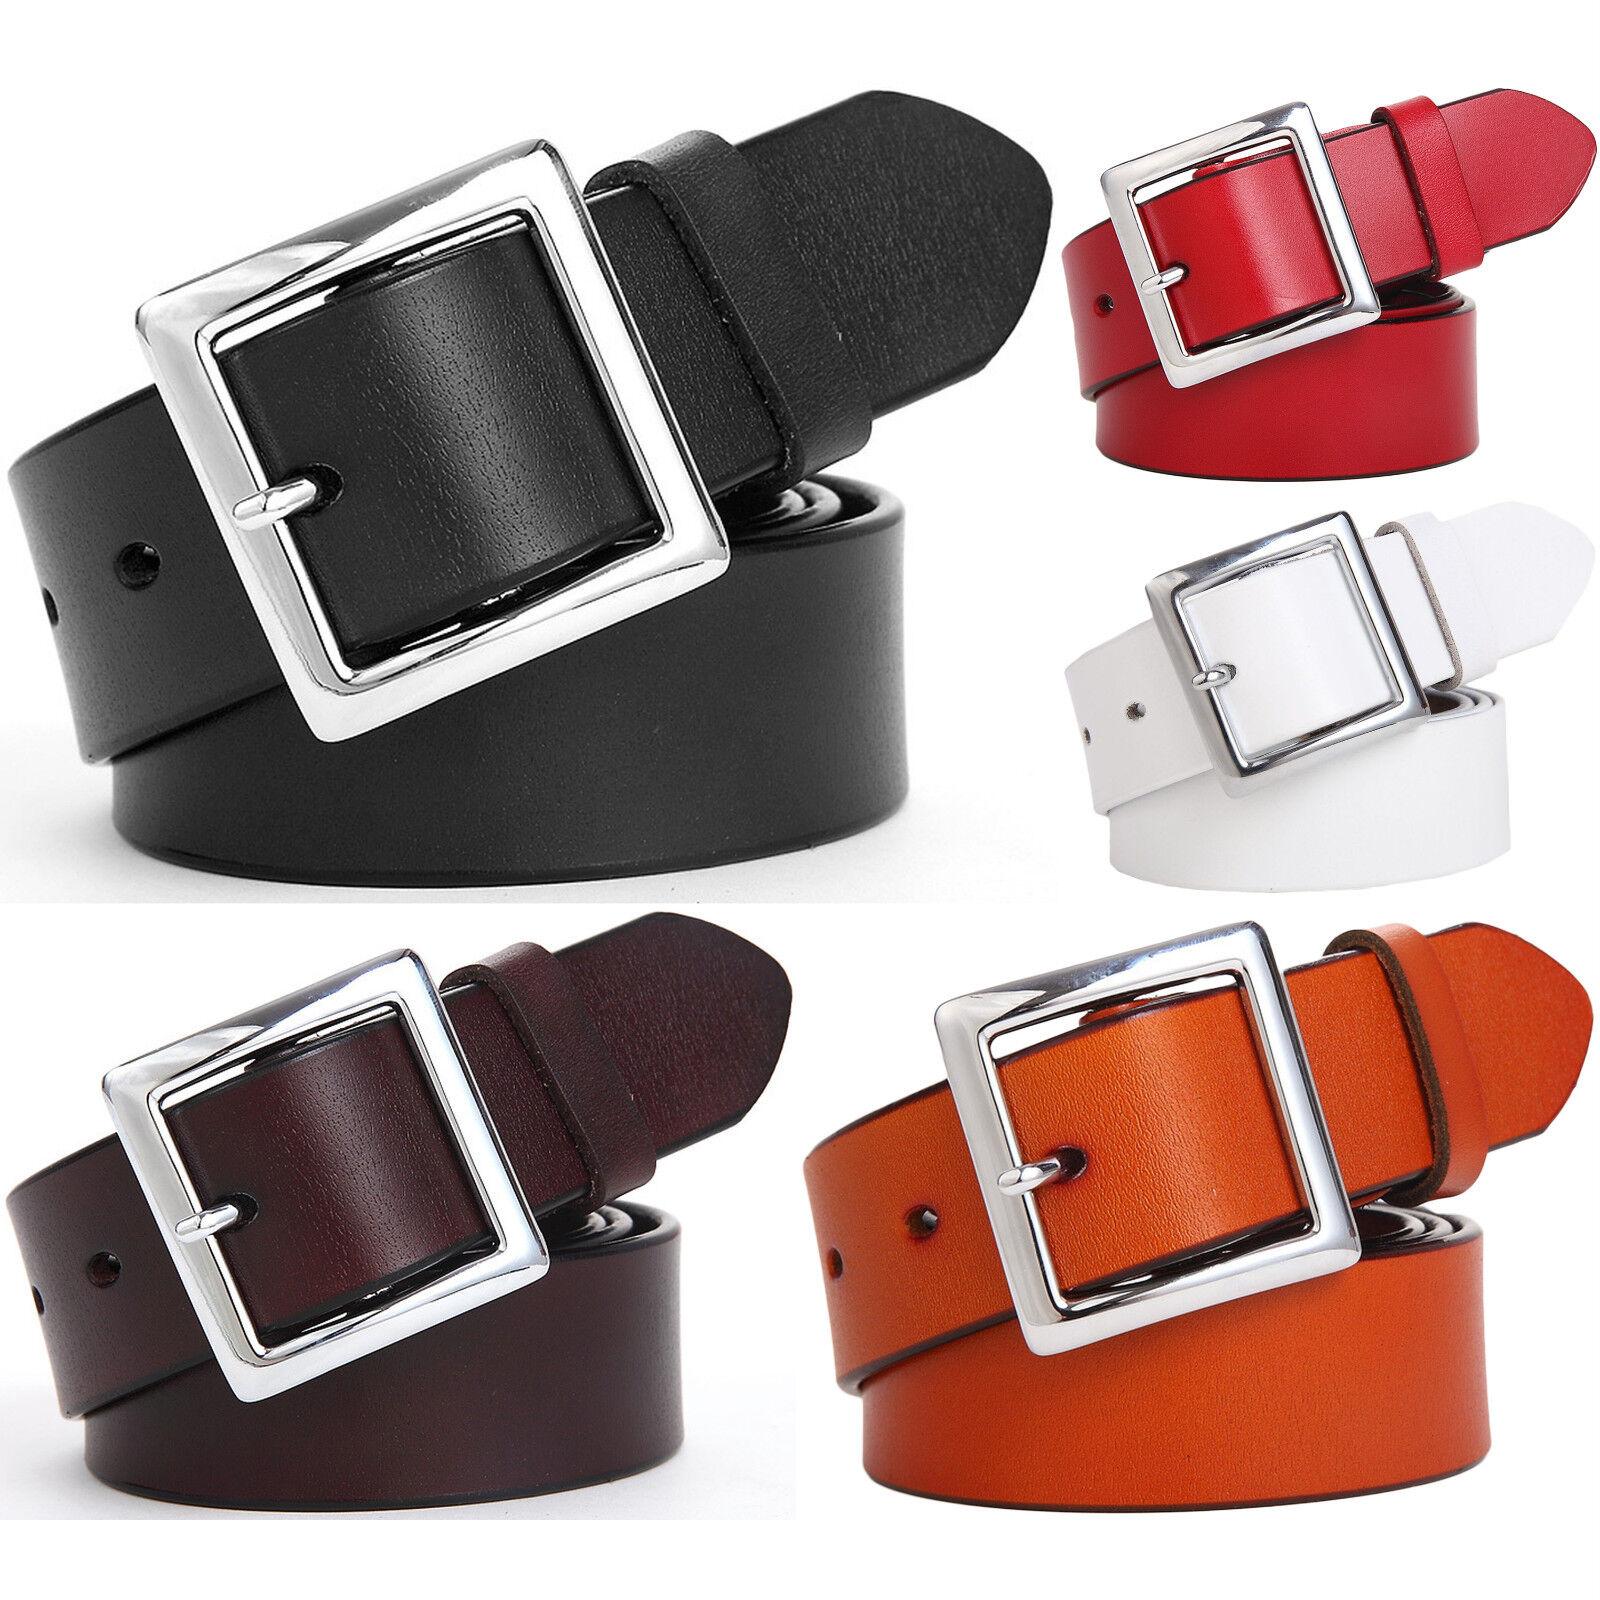 Women's Jean Belt, Classic Square Buckle Handcrafted Leather Belt Belts